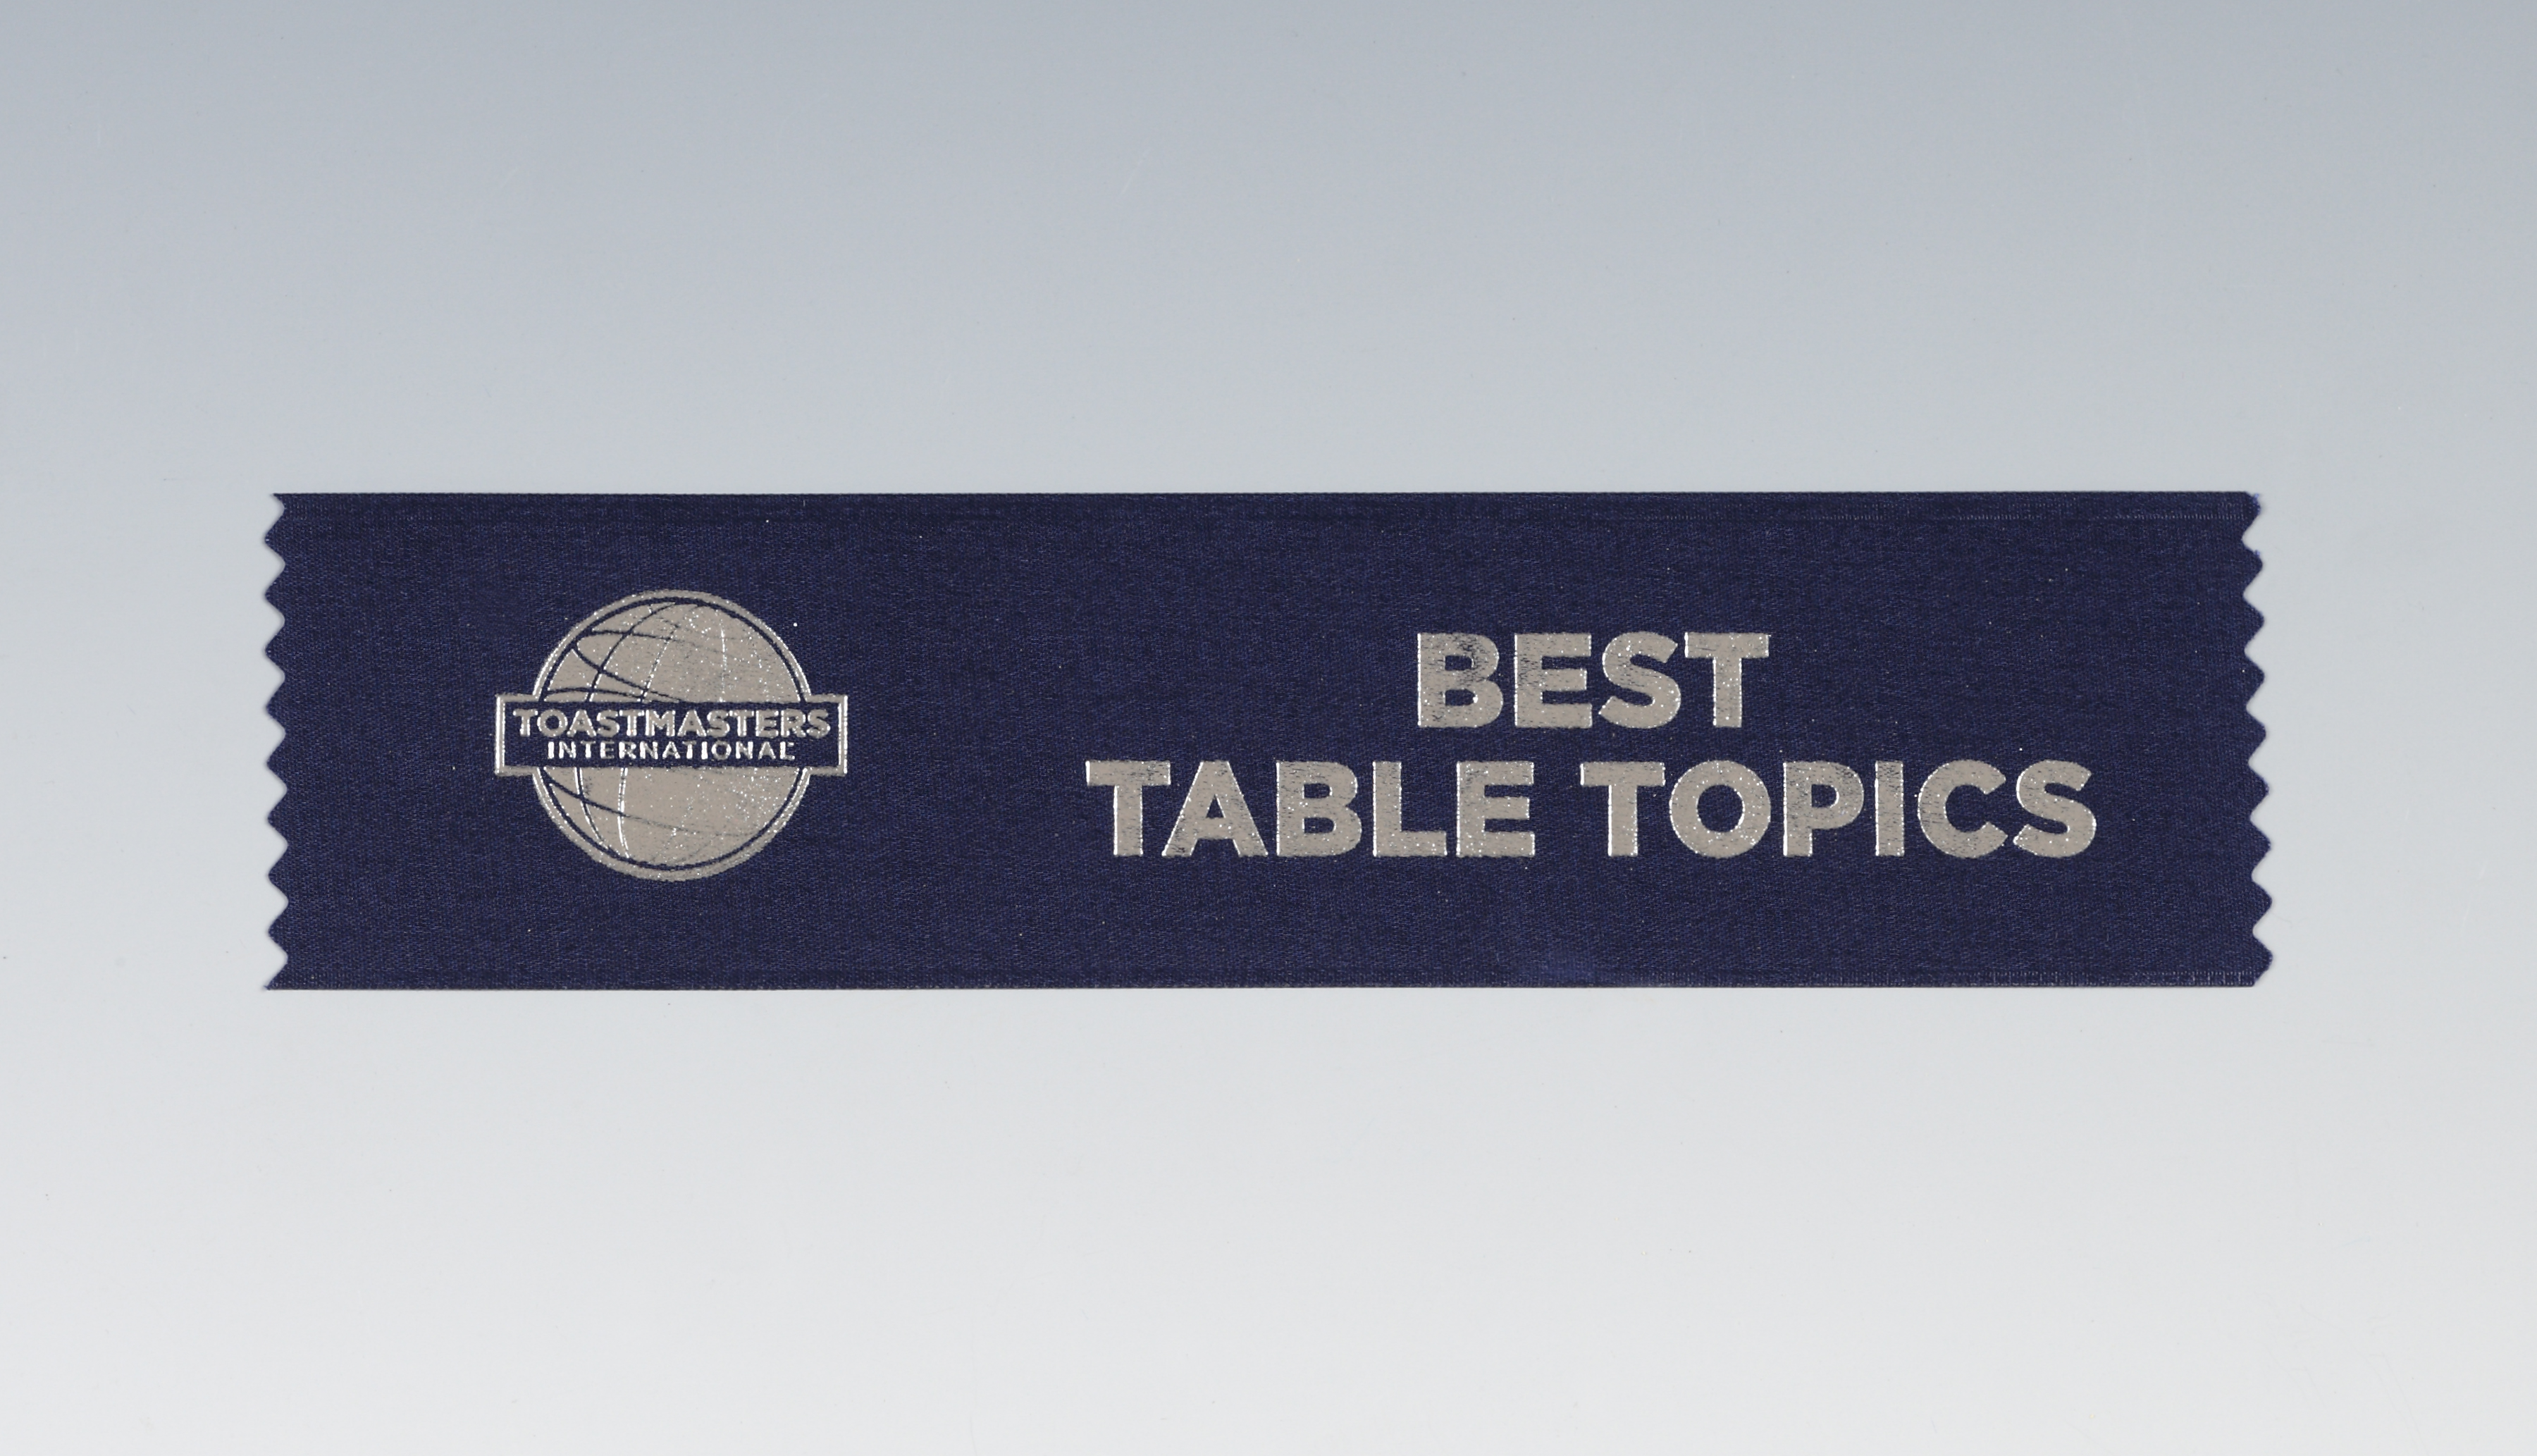 Best Table Topics™ Ribbon